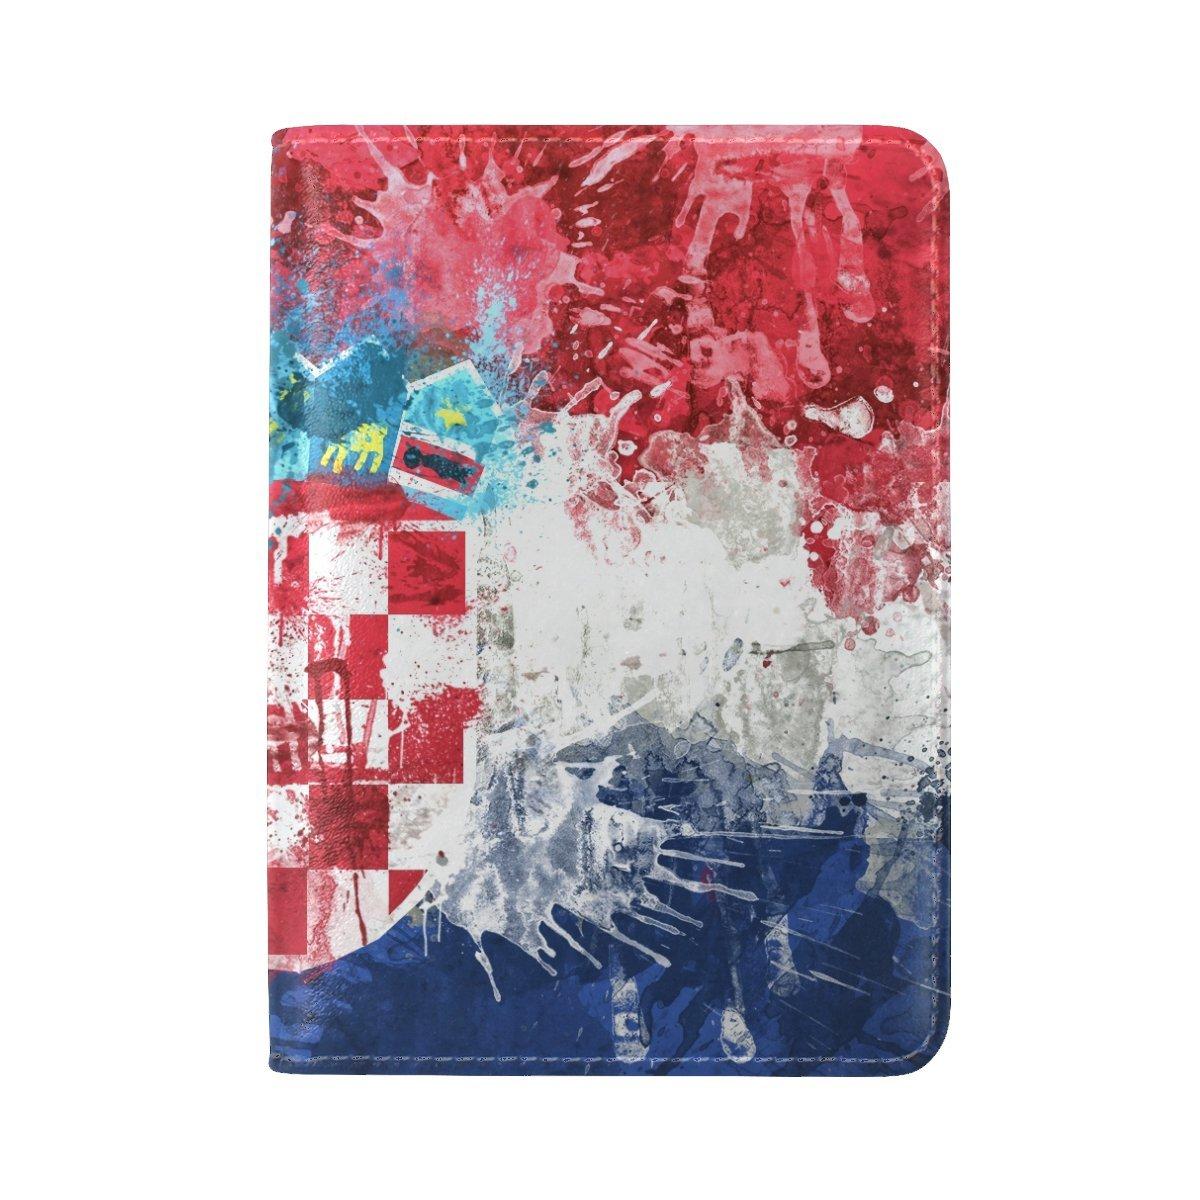 Croatia Flag Republic Background Texture Paint Coat Leather Passport Holder Cover Case Travel One Pocket